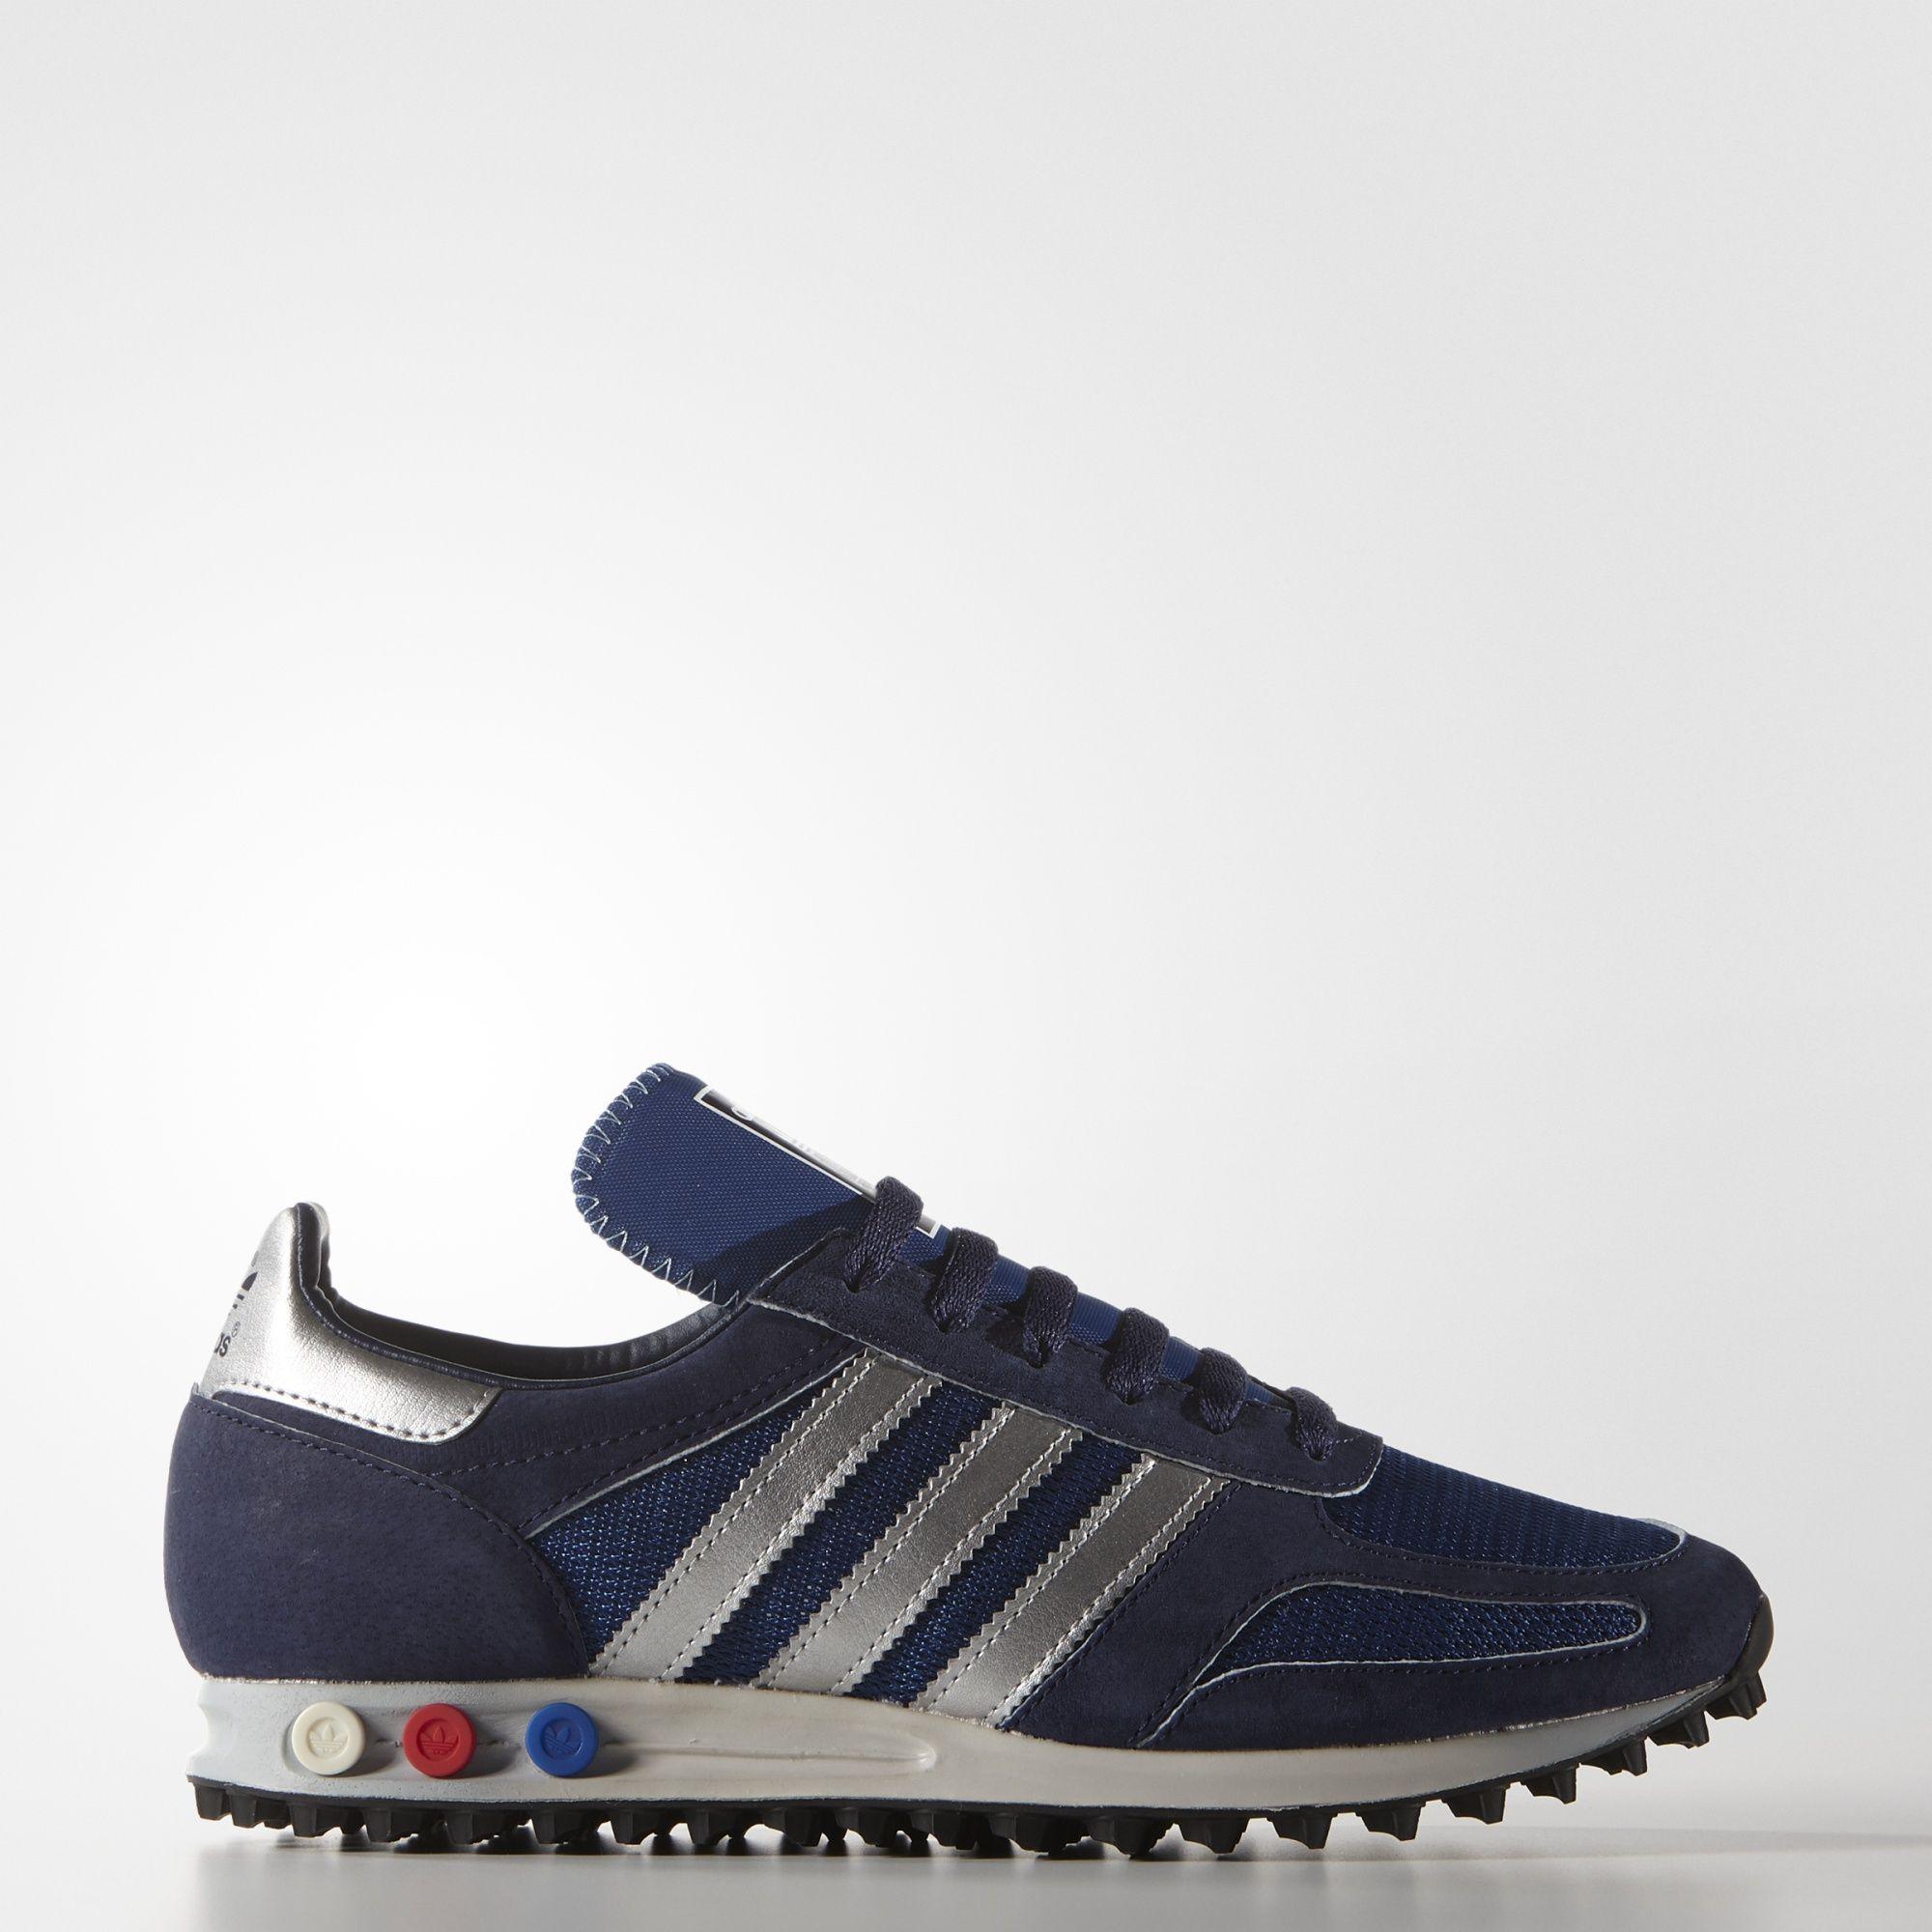 Adidas ORIGINALS LA TRAINER OG | ShoesOCK | Adidas, Adidas